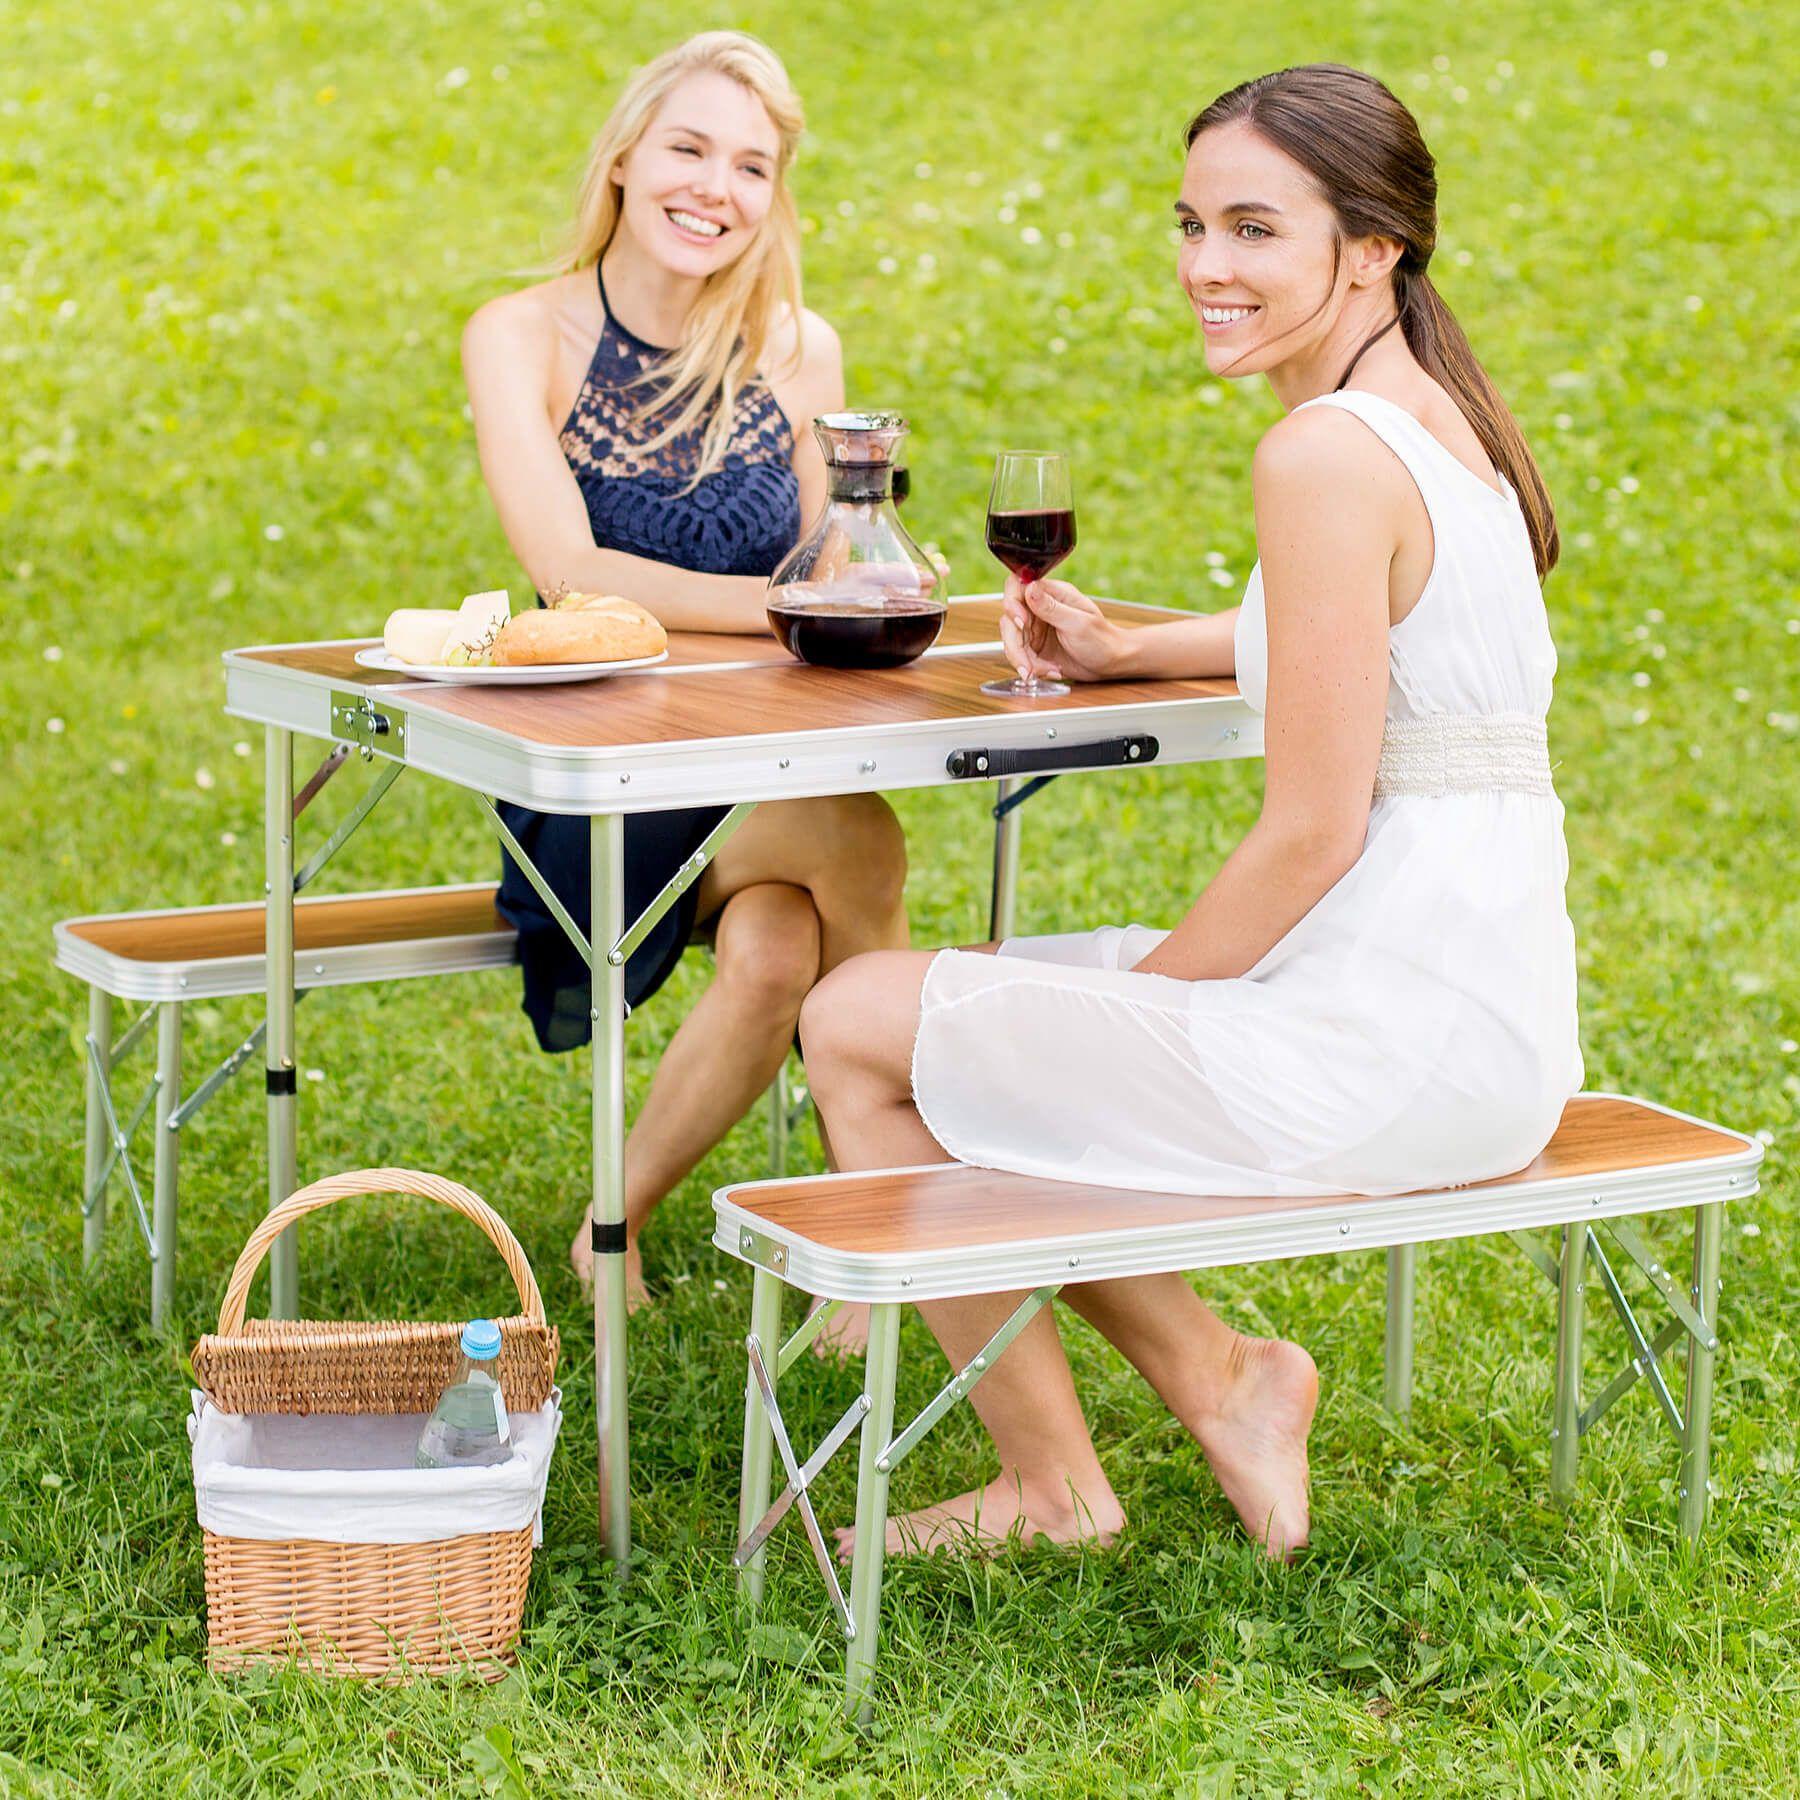 Mesa maleta 2 asientos bancos camping plegable portátil jardín ...